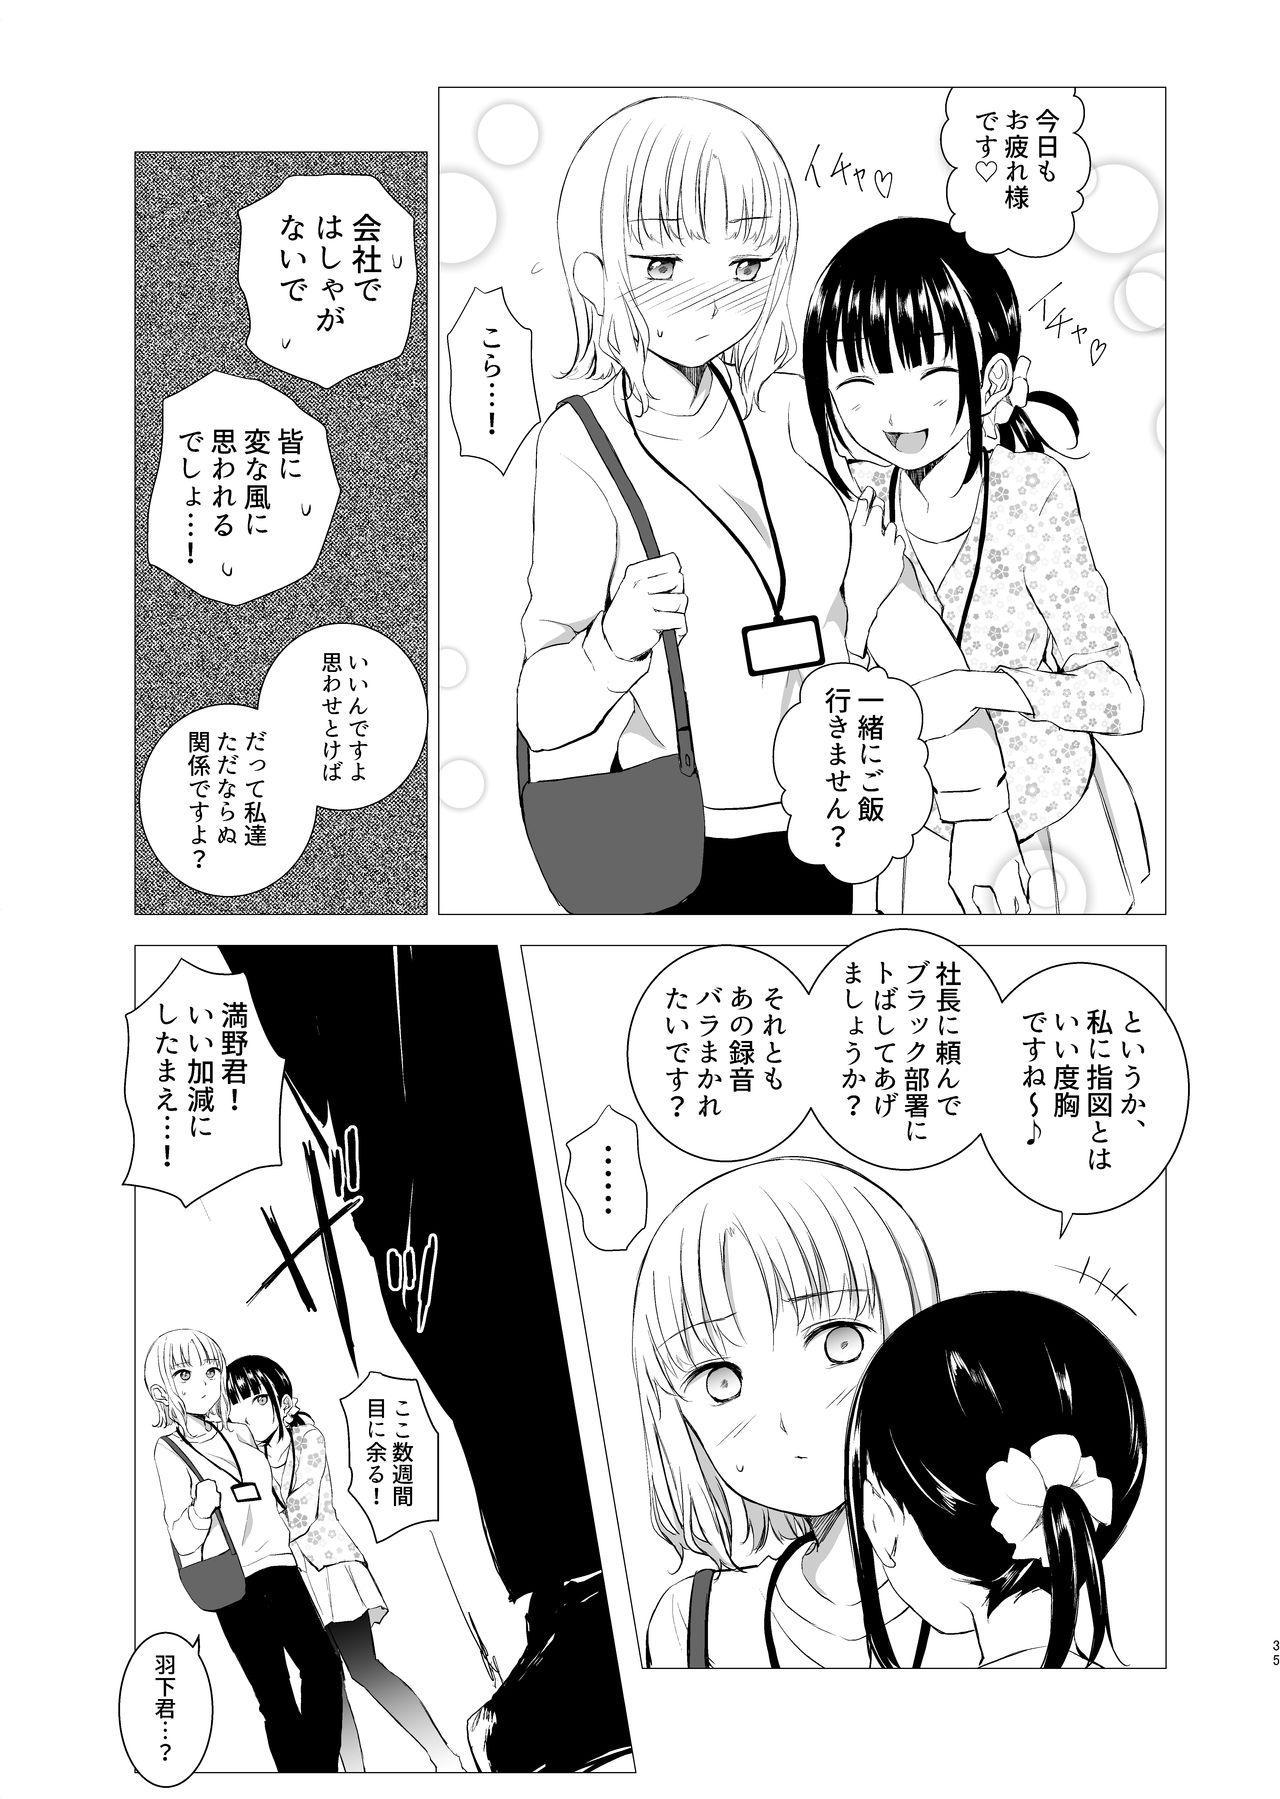 Hanayomi no Makurakotoba 33